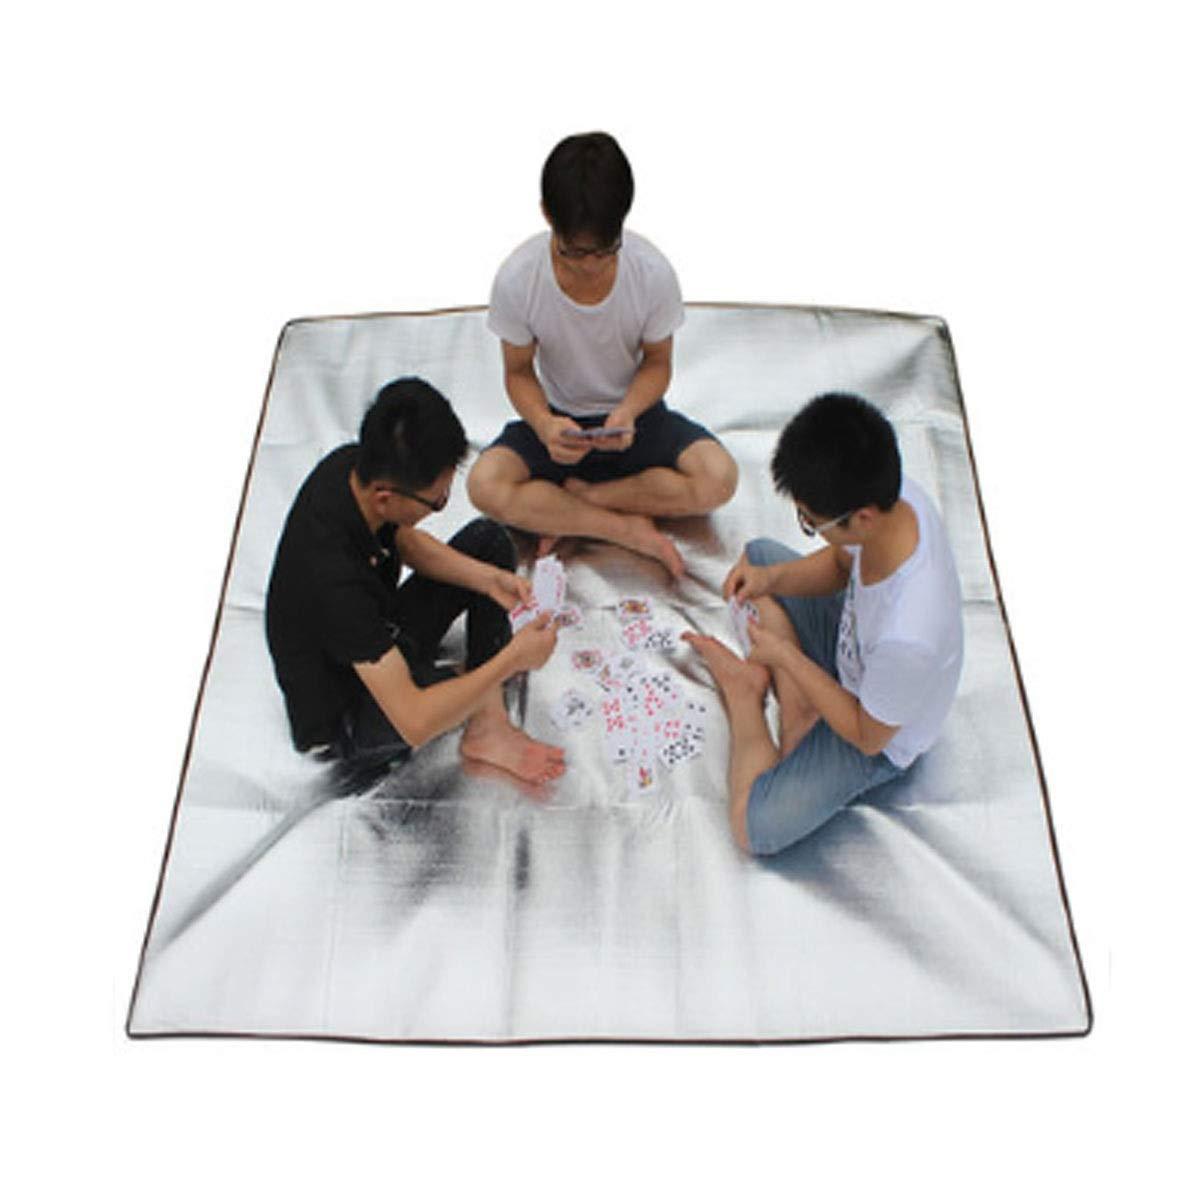 Hongyuantongxun Camping Mat Suitable for Outdoor Travel Outdoor Waterproof Beach Mat Picnic Mat 200 * 200 cm Silver Beautiful